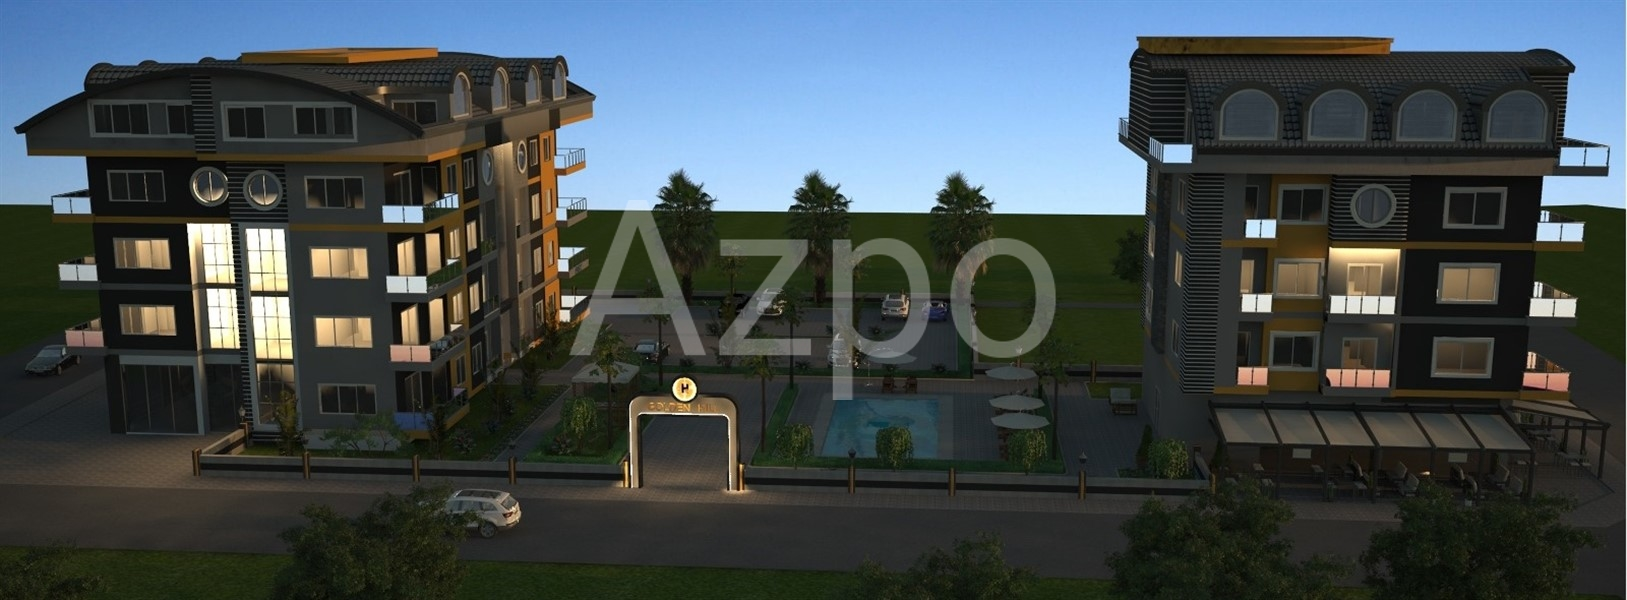 Строительство резиденции в районе Оба - Фото 9